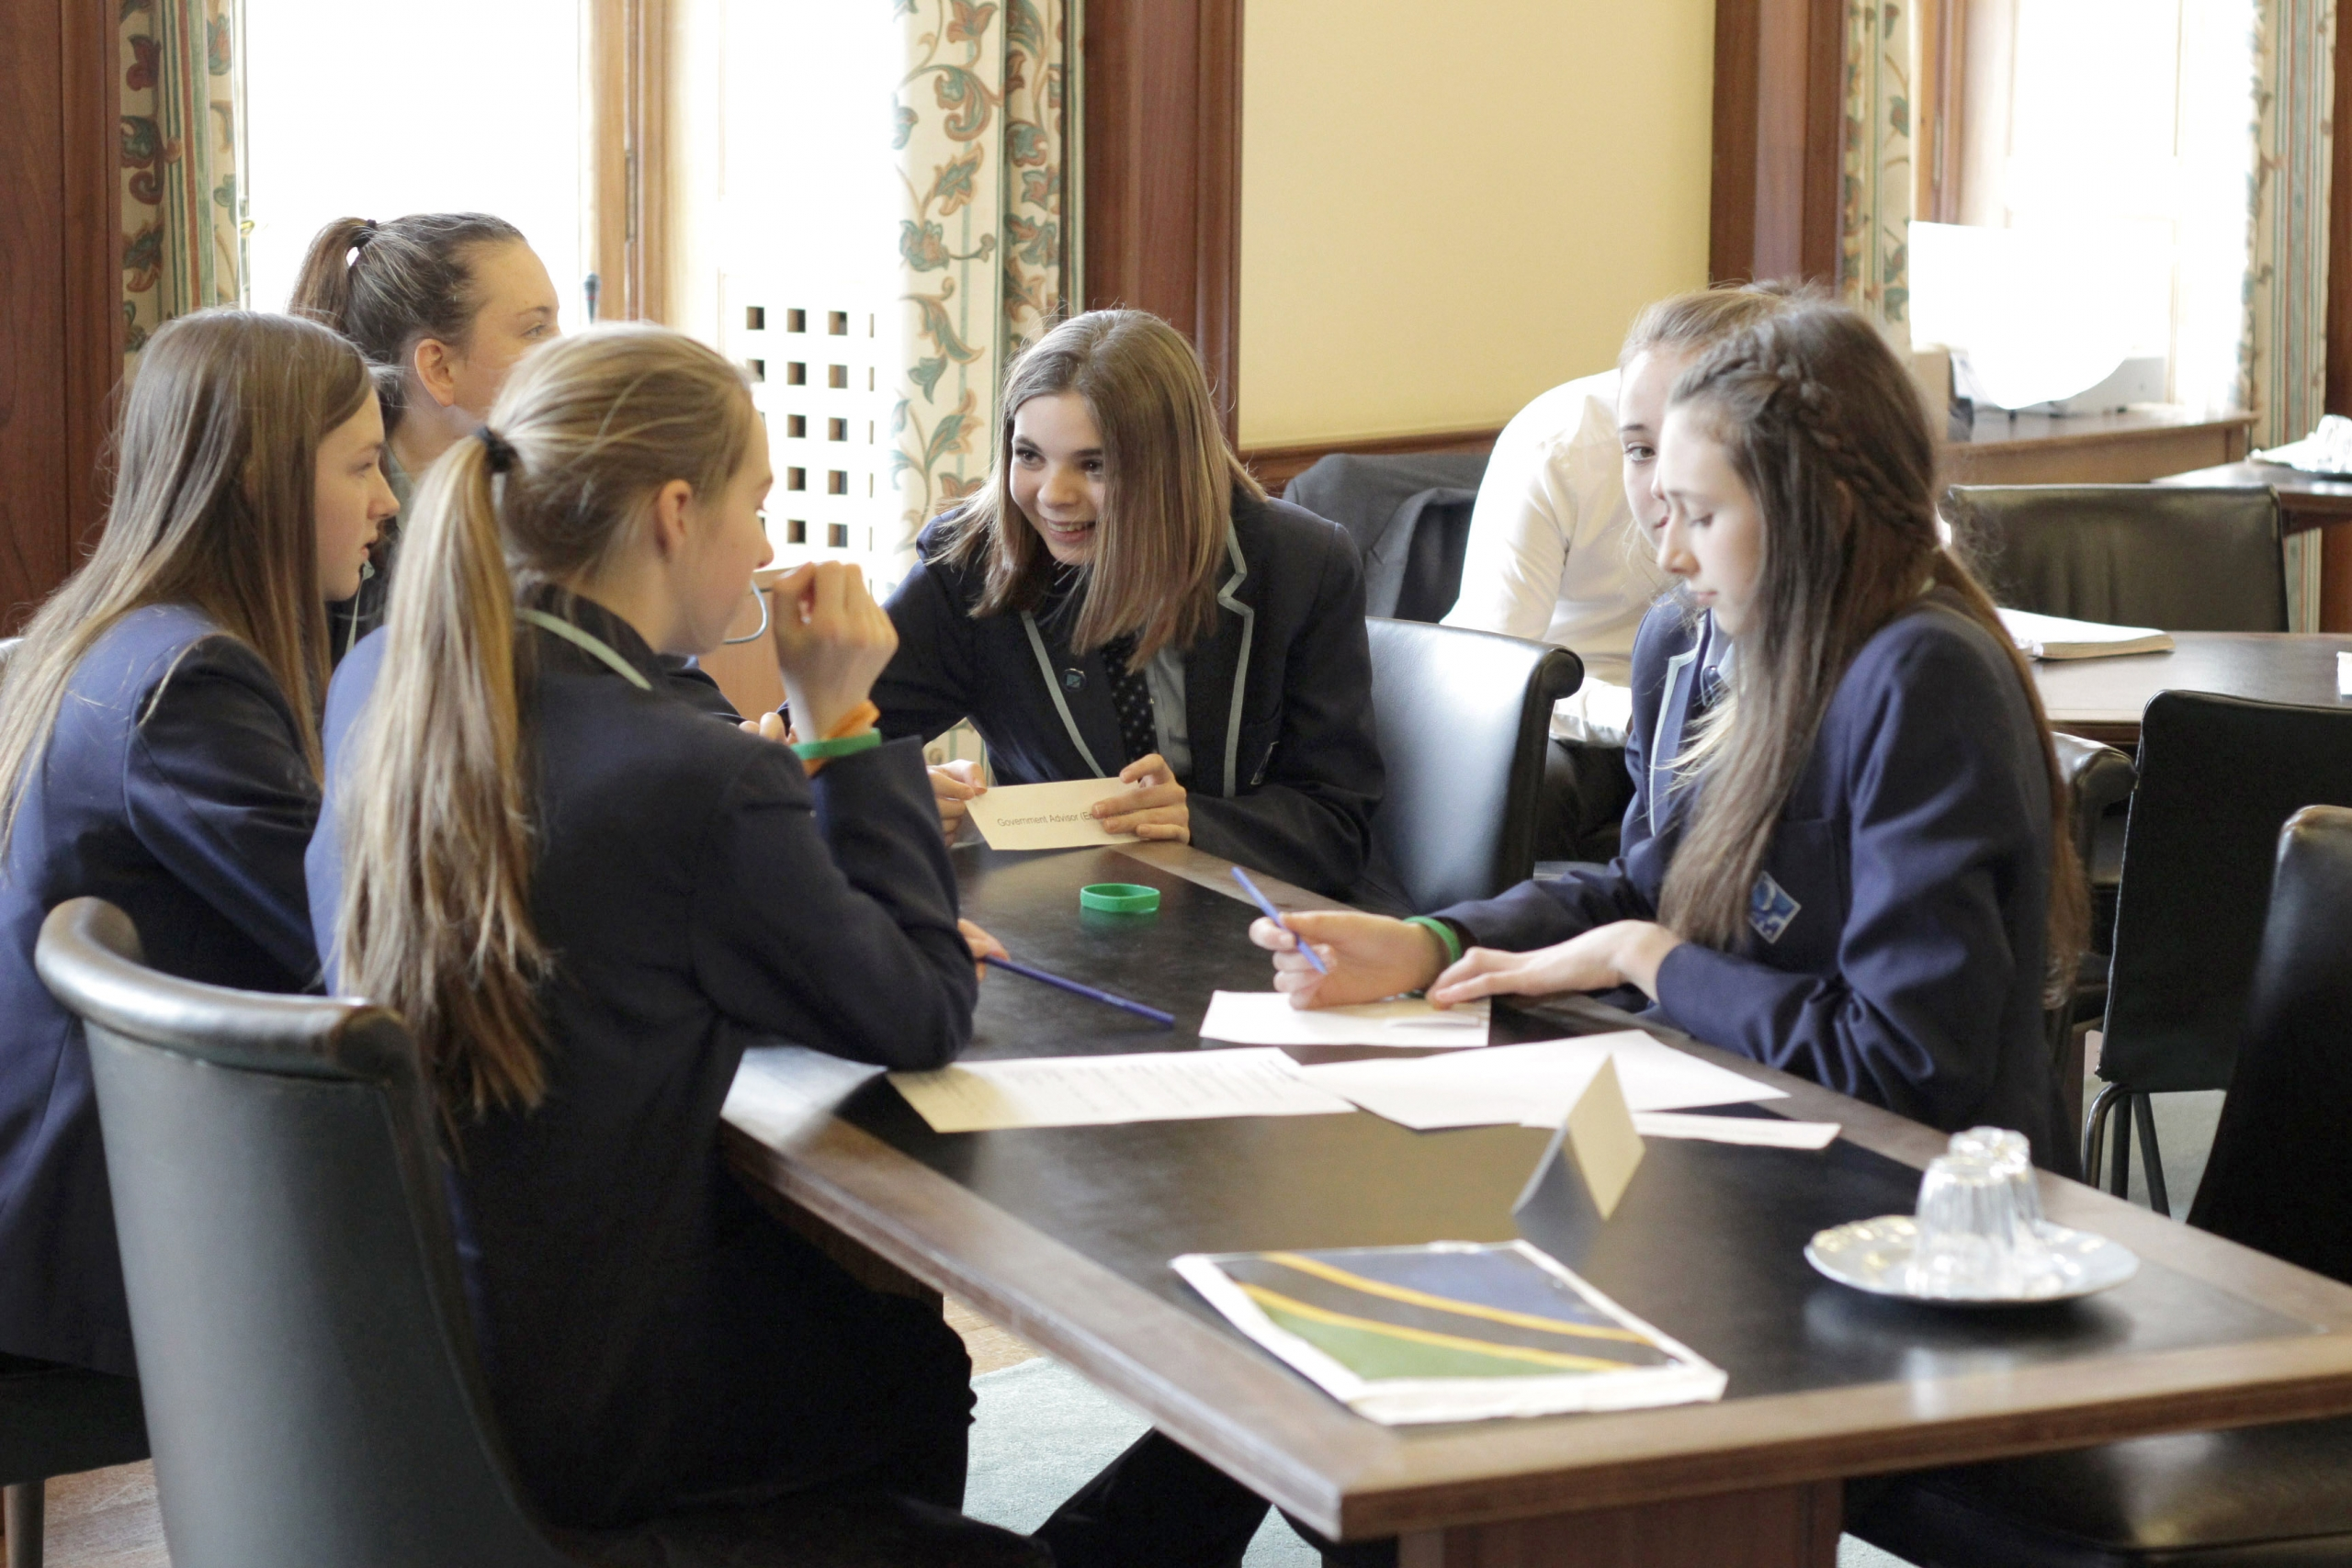 students talk through a problem in a team